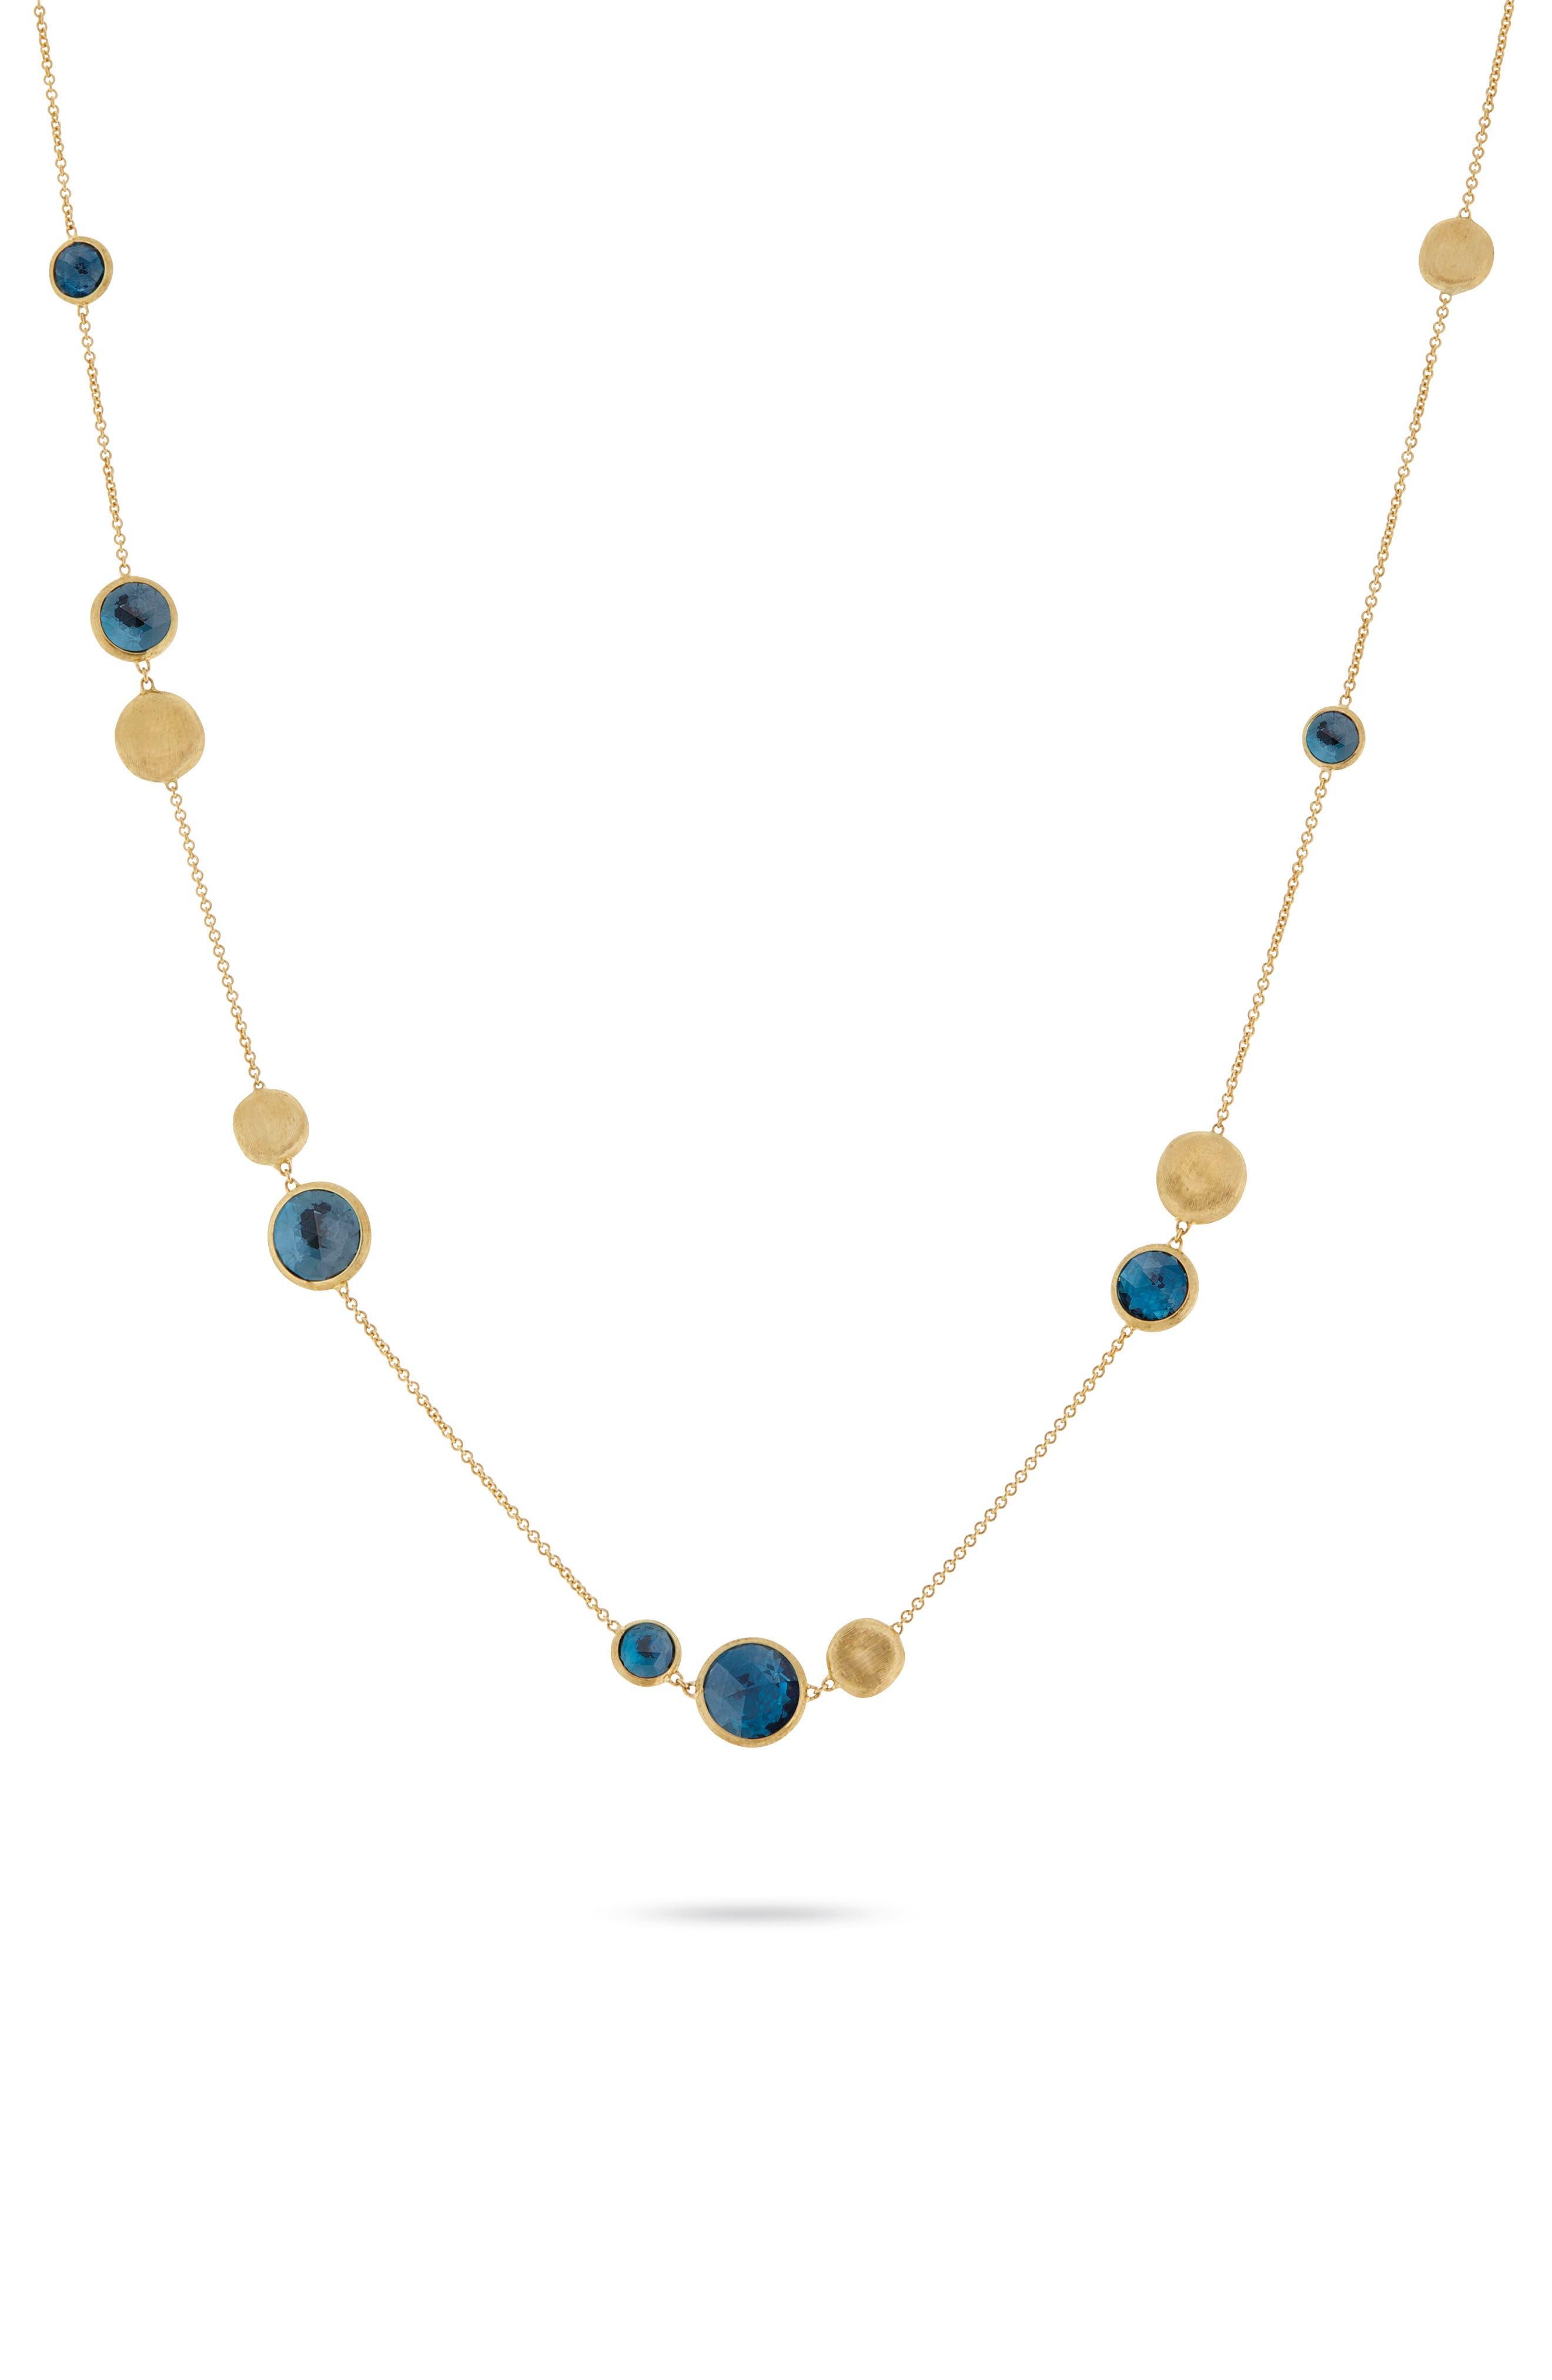 Main Image - Marco Biecego Jaipur Semiprecious Stone Necklace